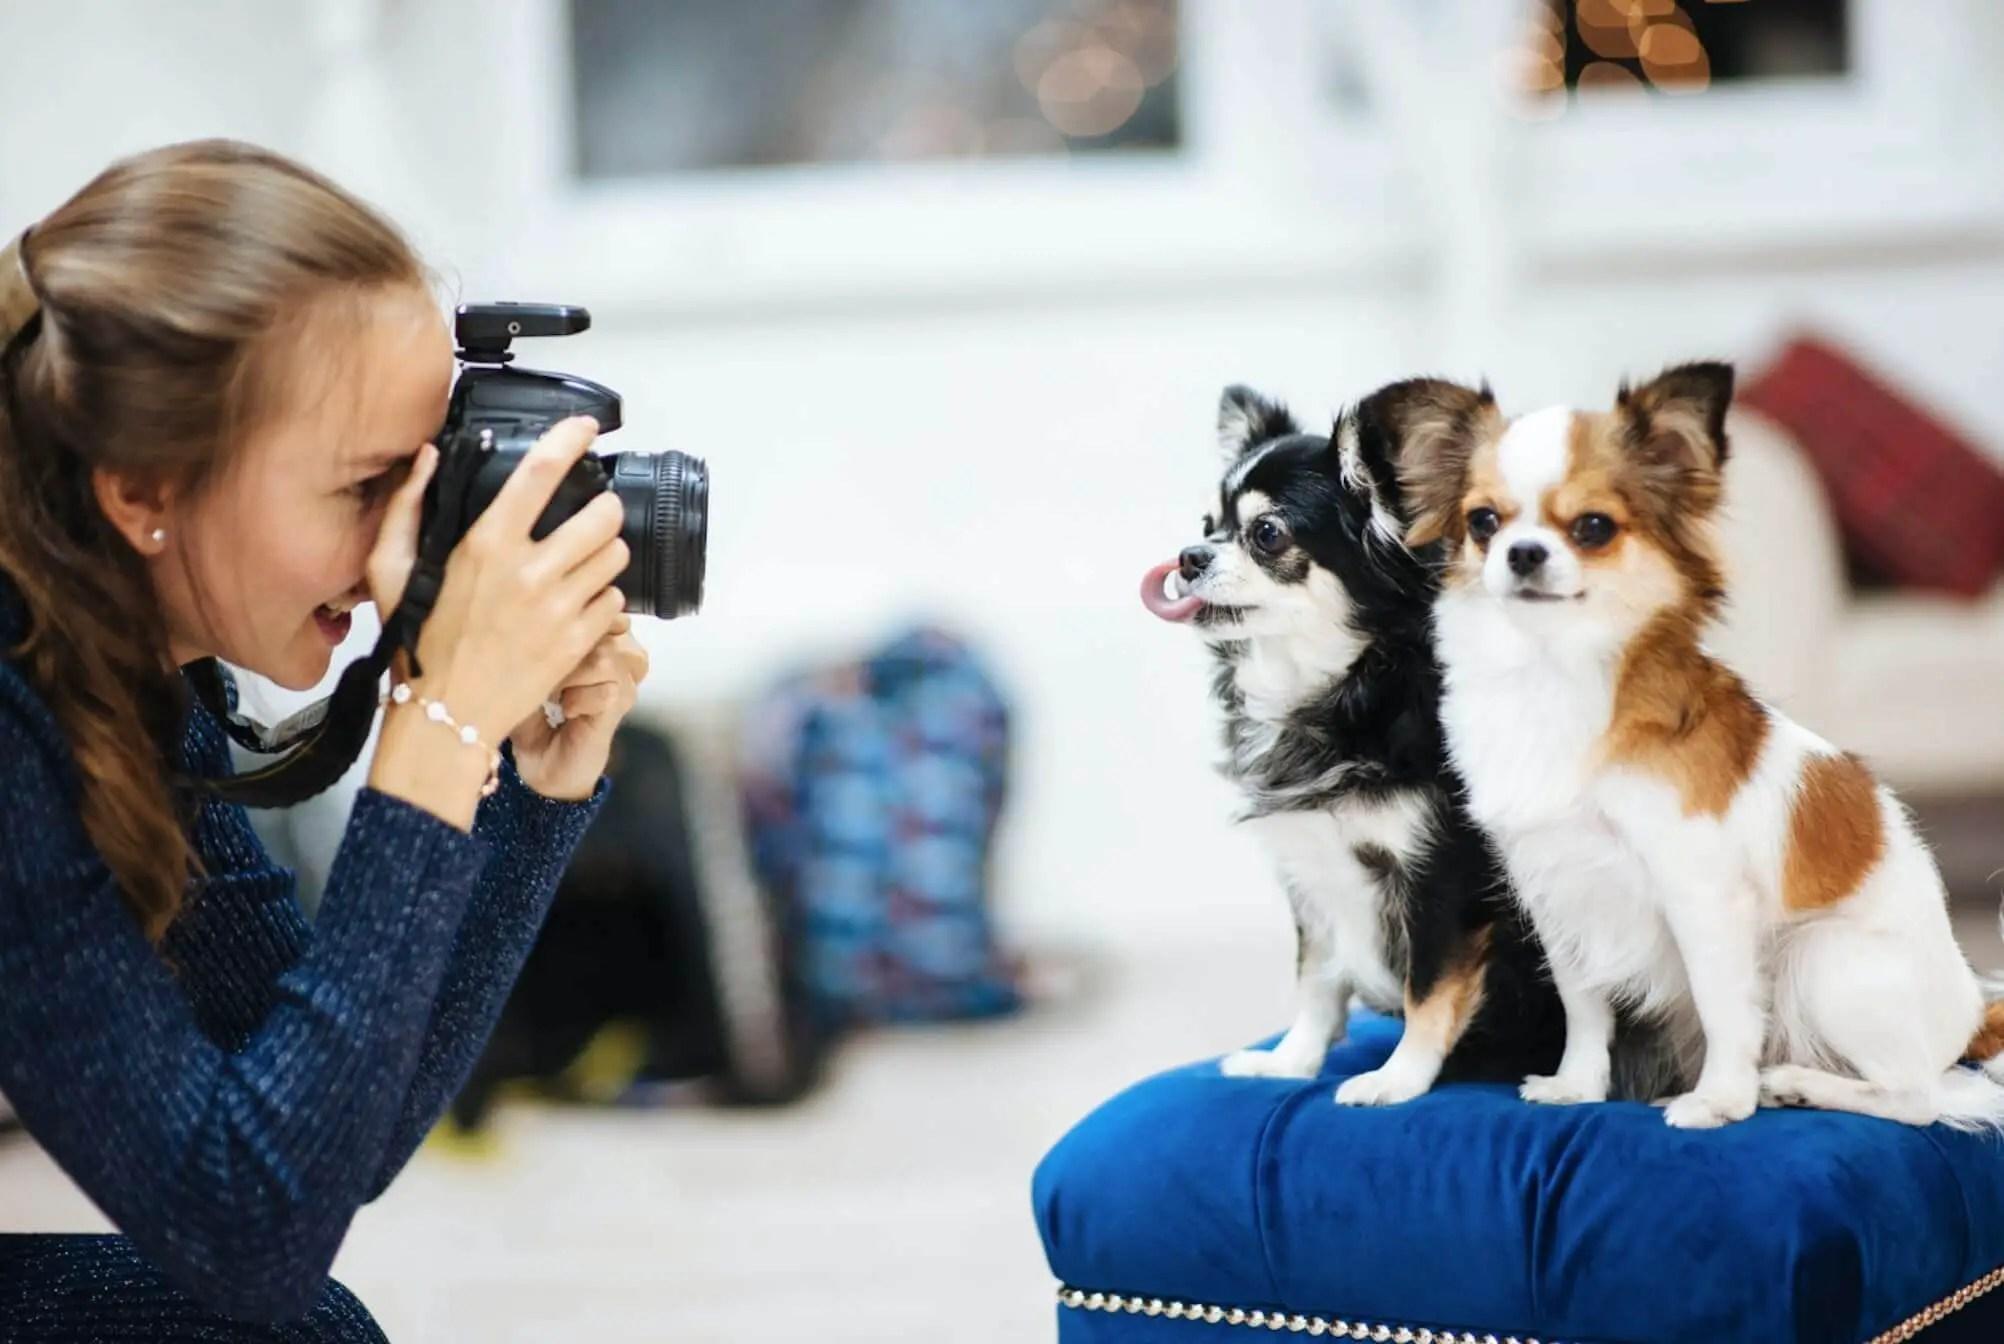 pet photographer shooting 2 dogs chihuahua